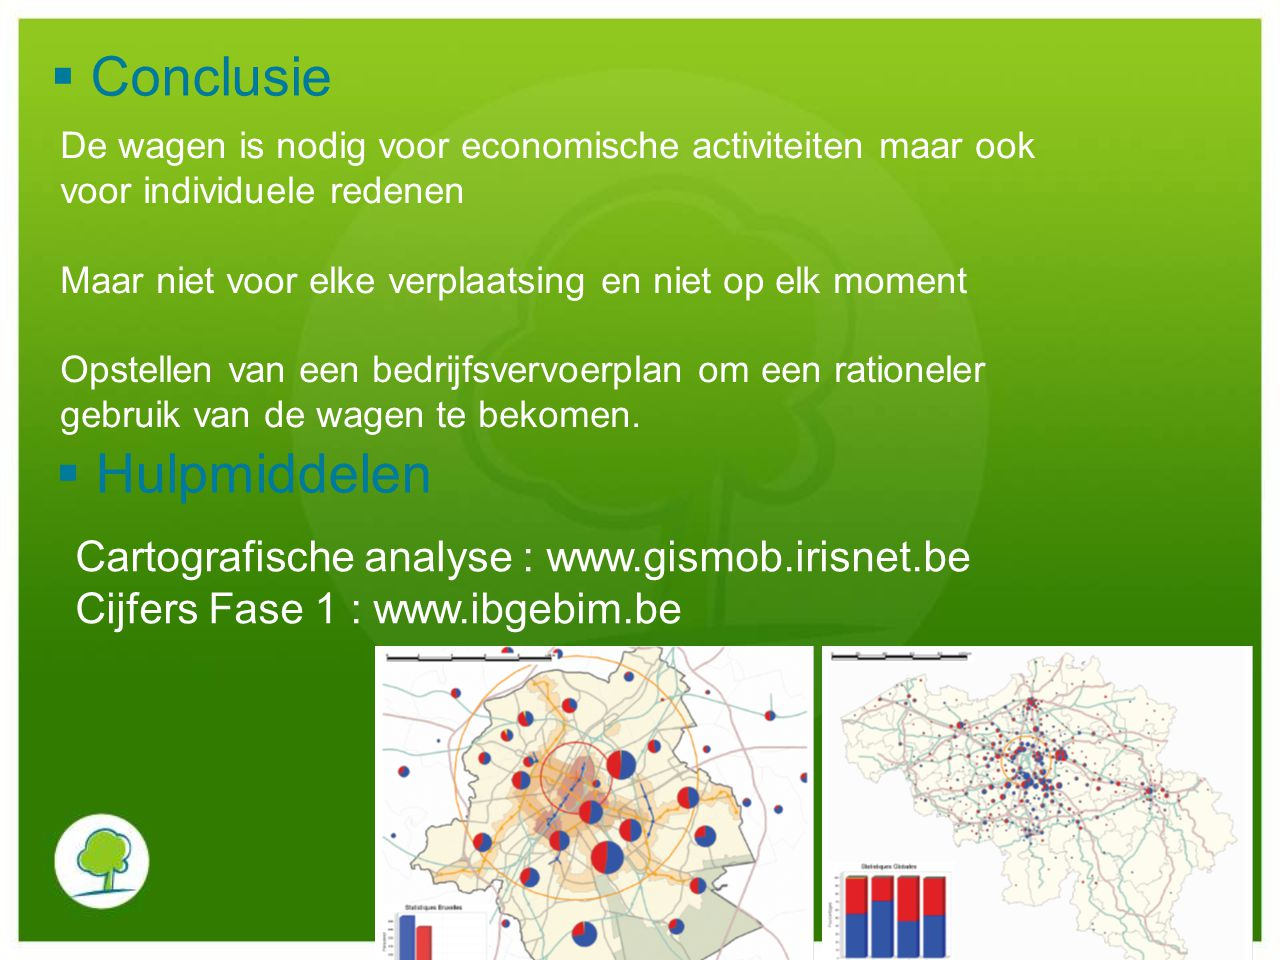 Conclusie Hulpmiddelen Cartografische analyse : www.gismob.irisnet.be